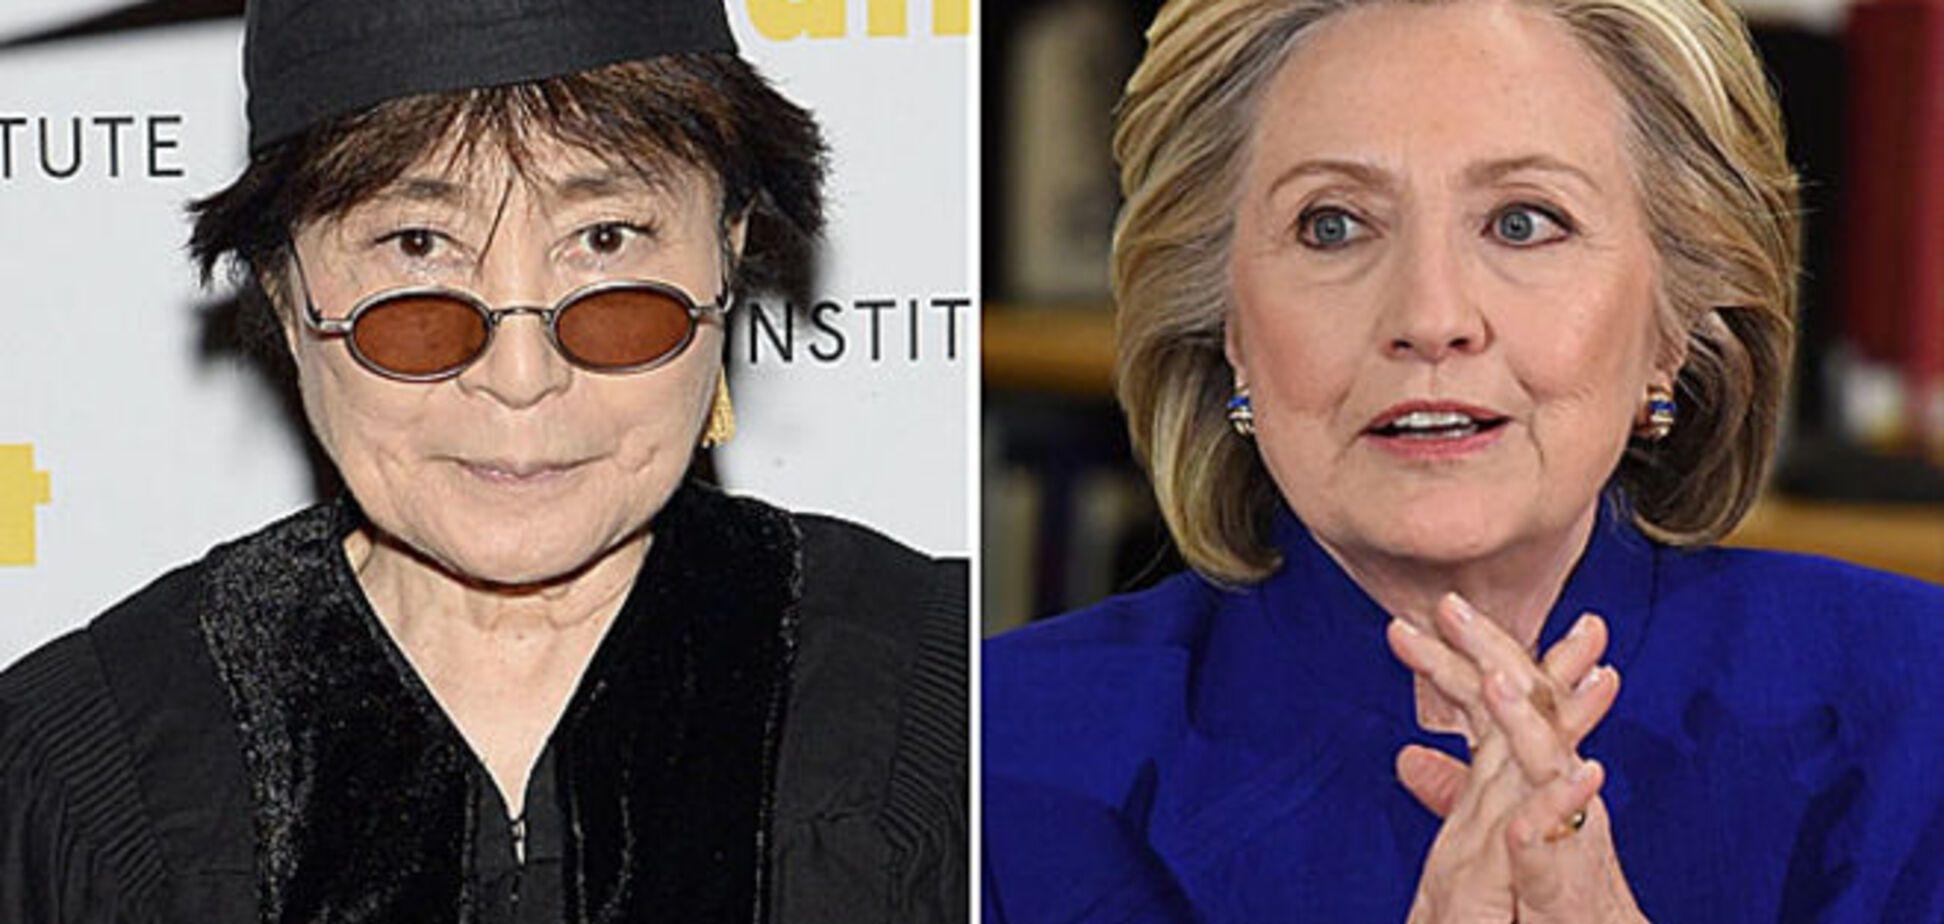 Роман Йоко Оно и Хиллари Клинтон оказался фейком